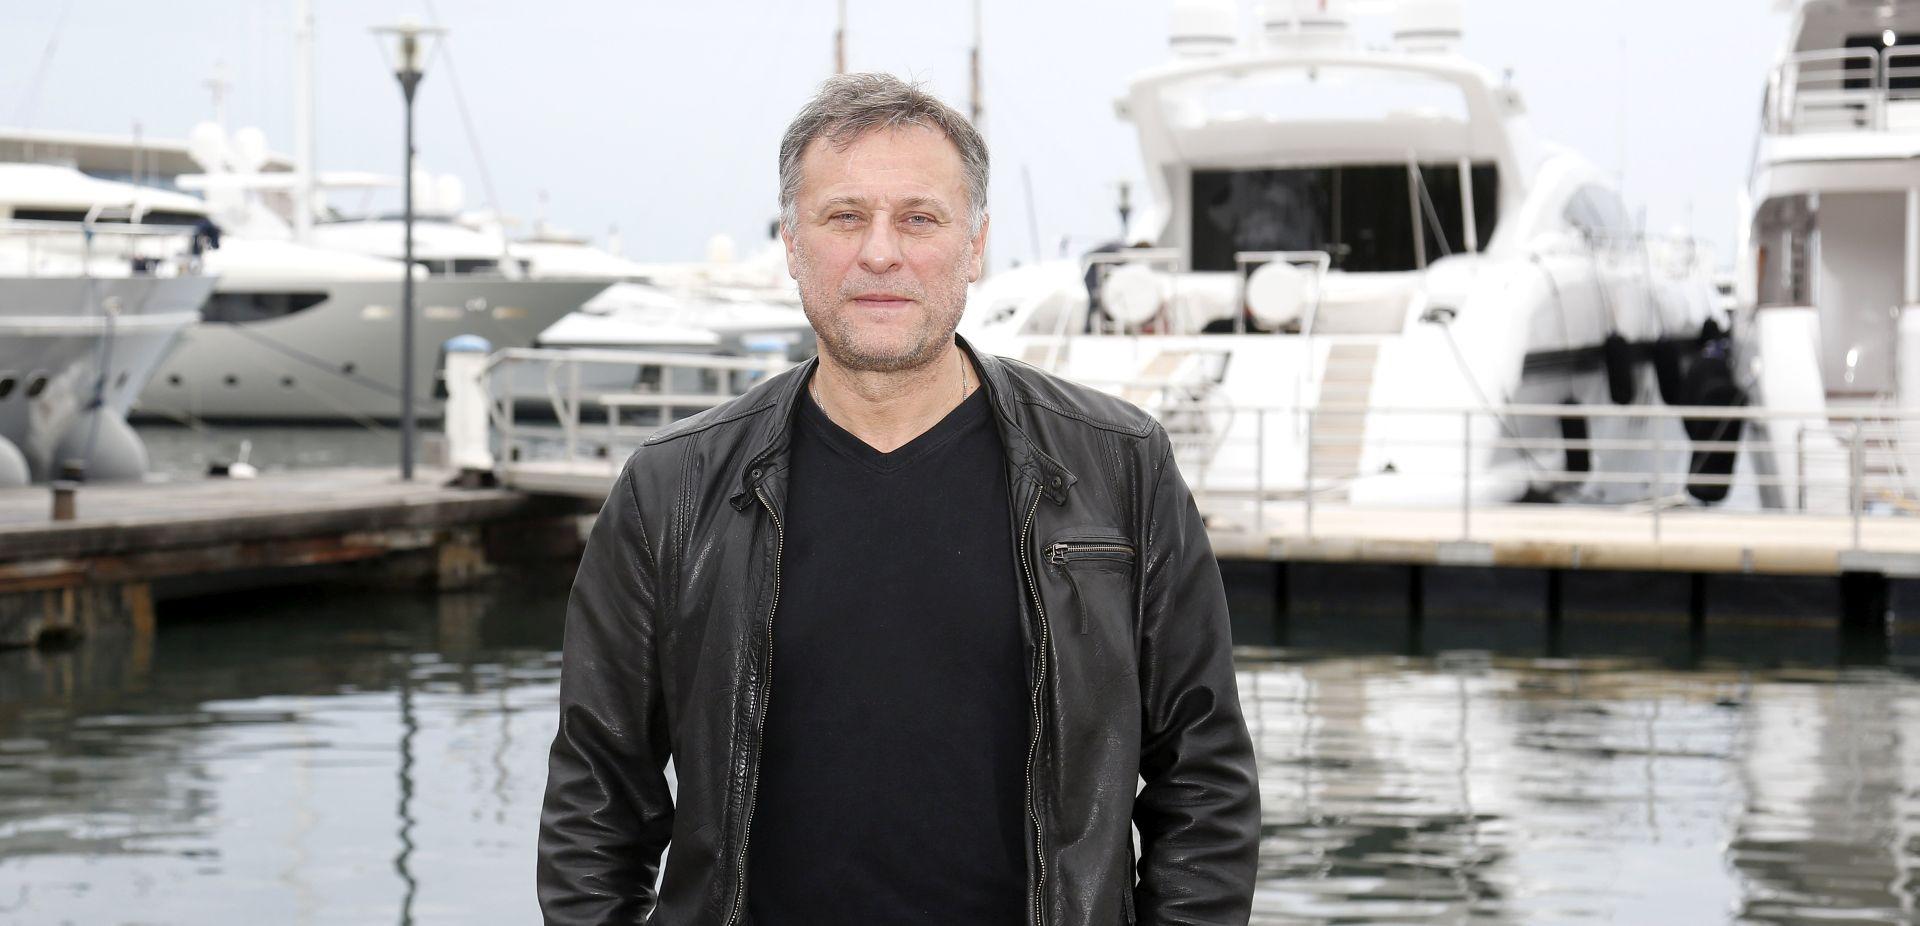 VIDEO: Preminuo slavni švedski glumac Michael Nyqvist